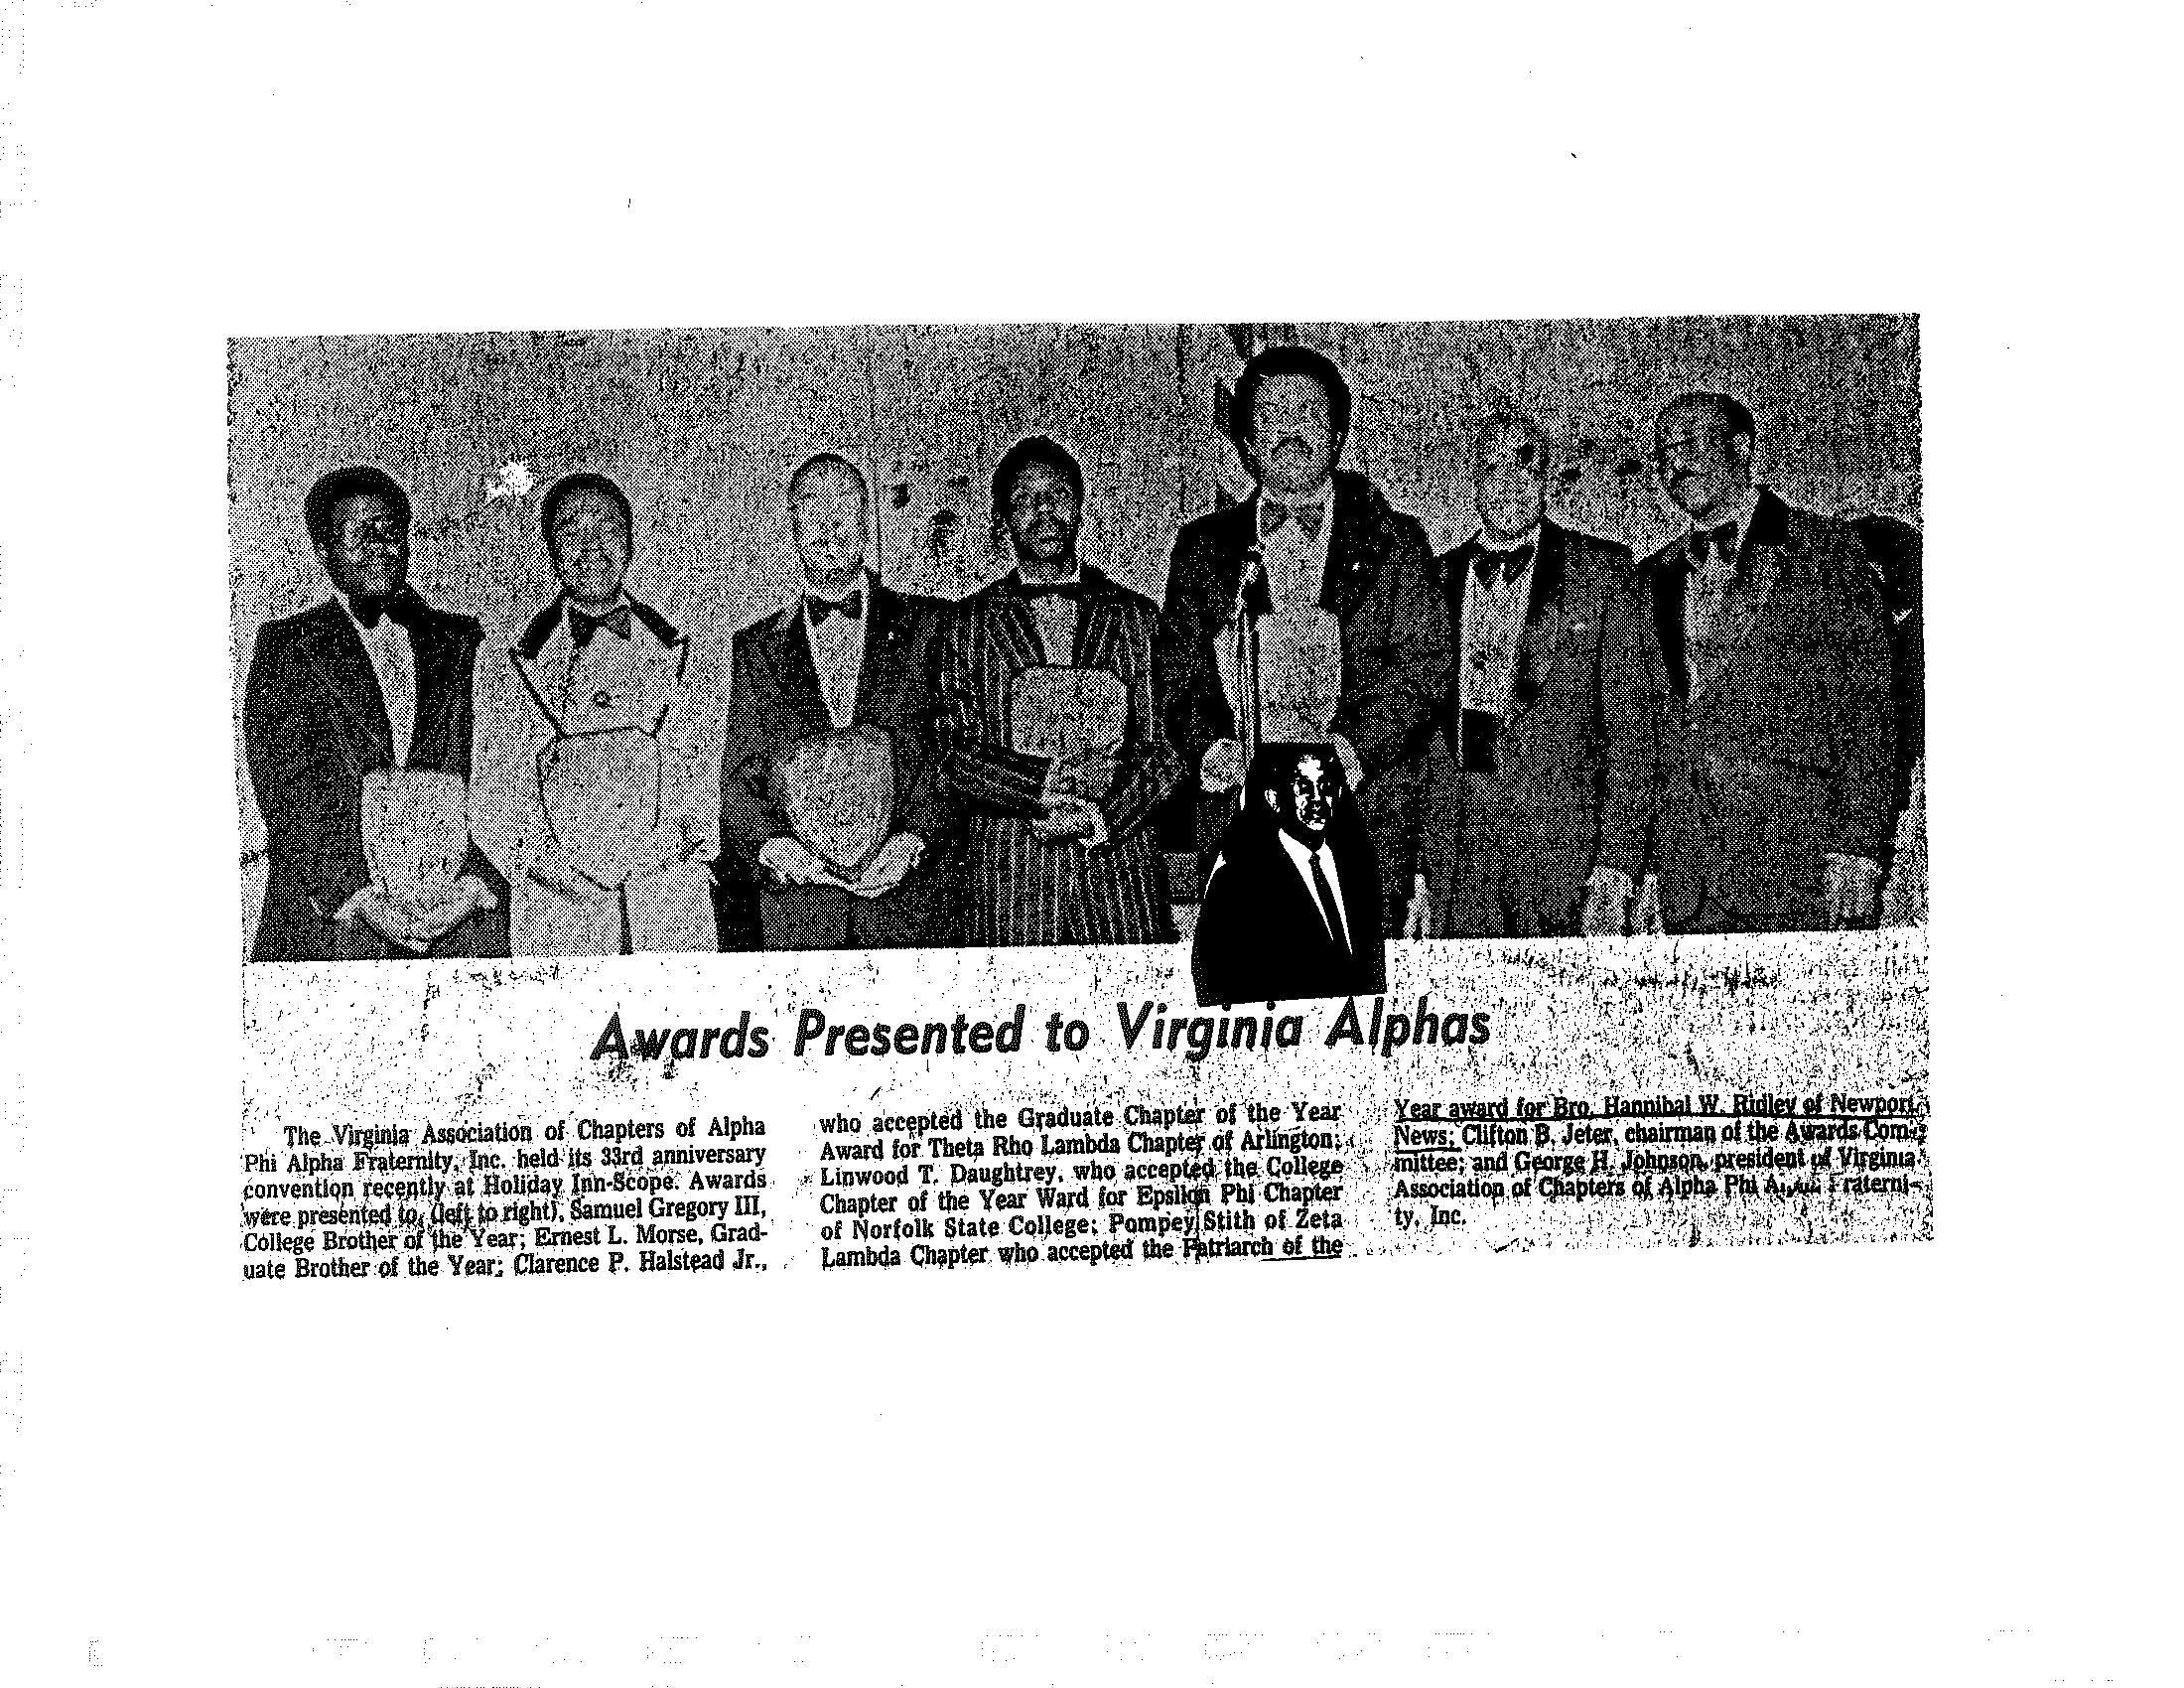 Zeta Lambda 1975 - Bro. Hannibal Ridley VACAPAF Patriach of the Year.png